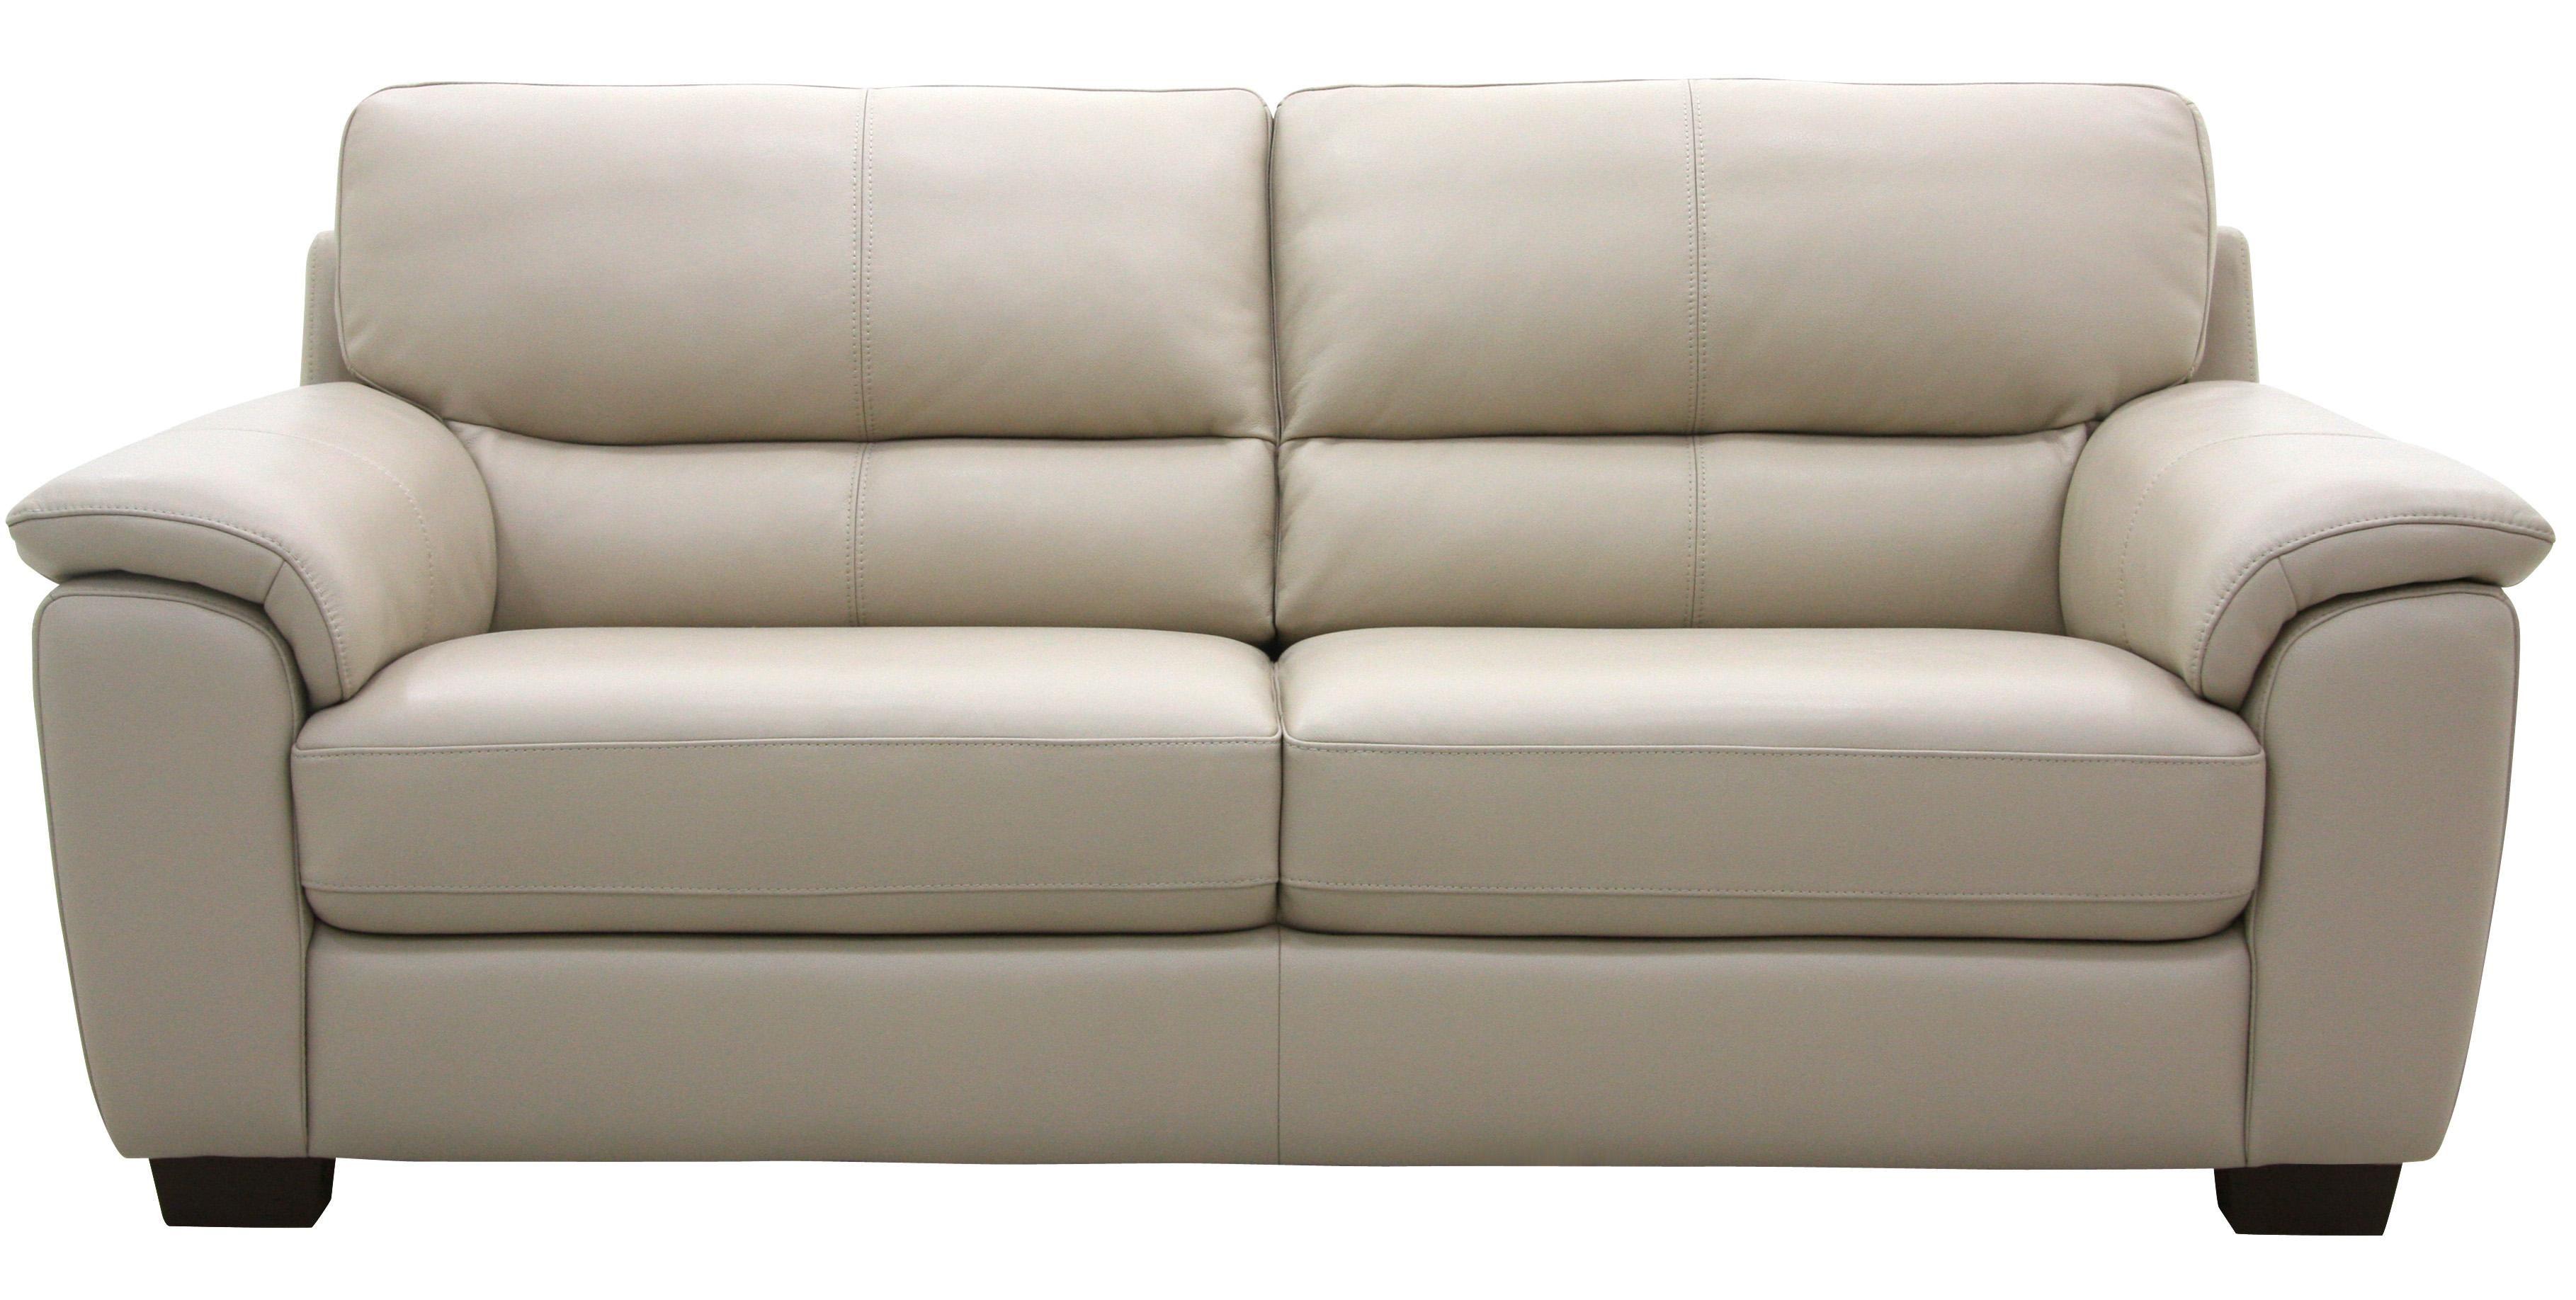 John Peters Leather Sofas